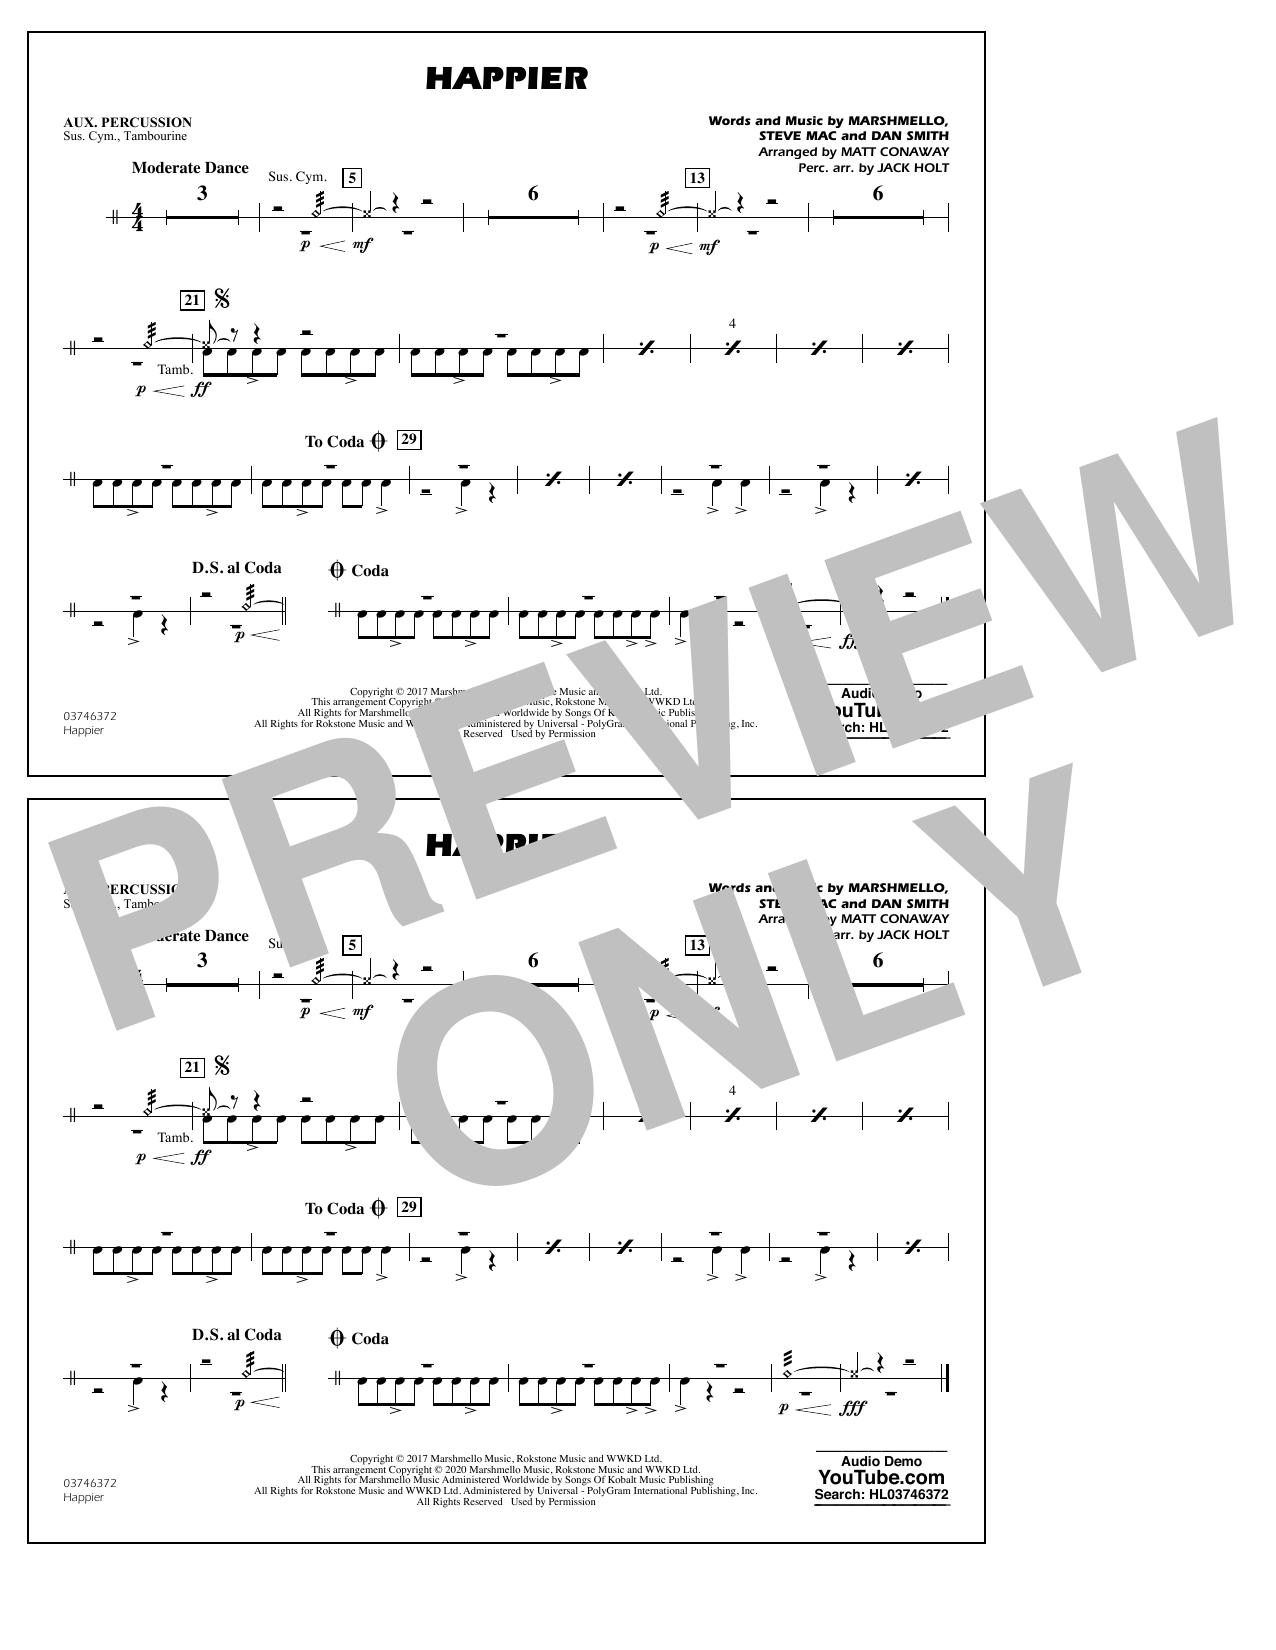 Happier (arr. Matt Conaway and Jack Holt) - Aux Percussion Sheet Music